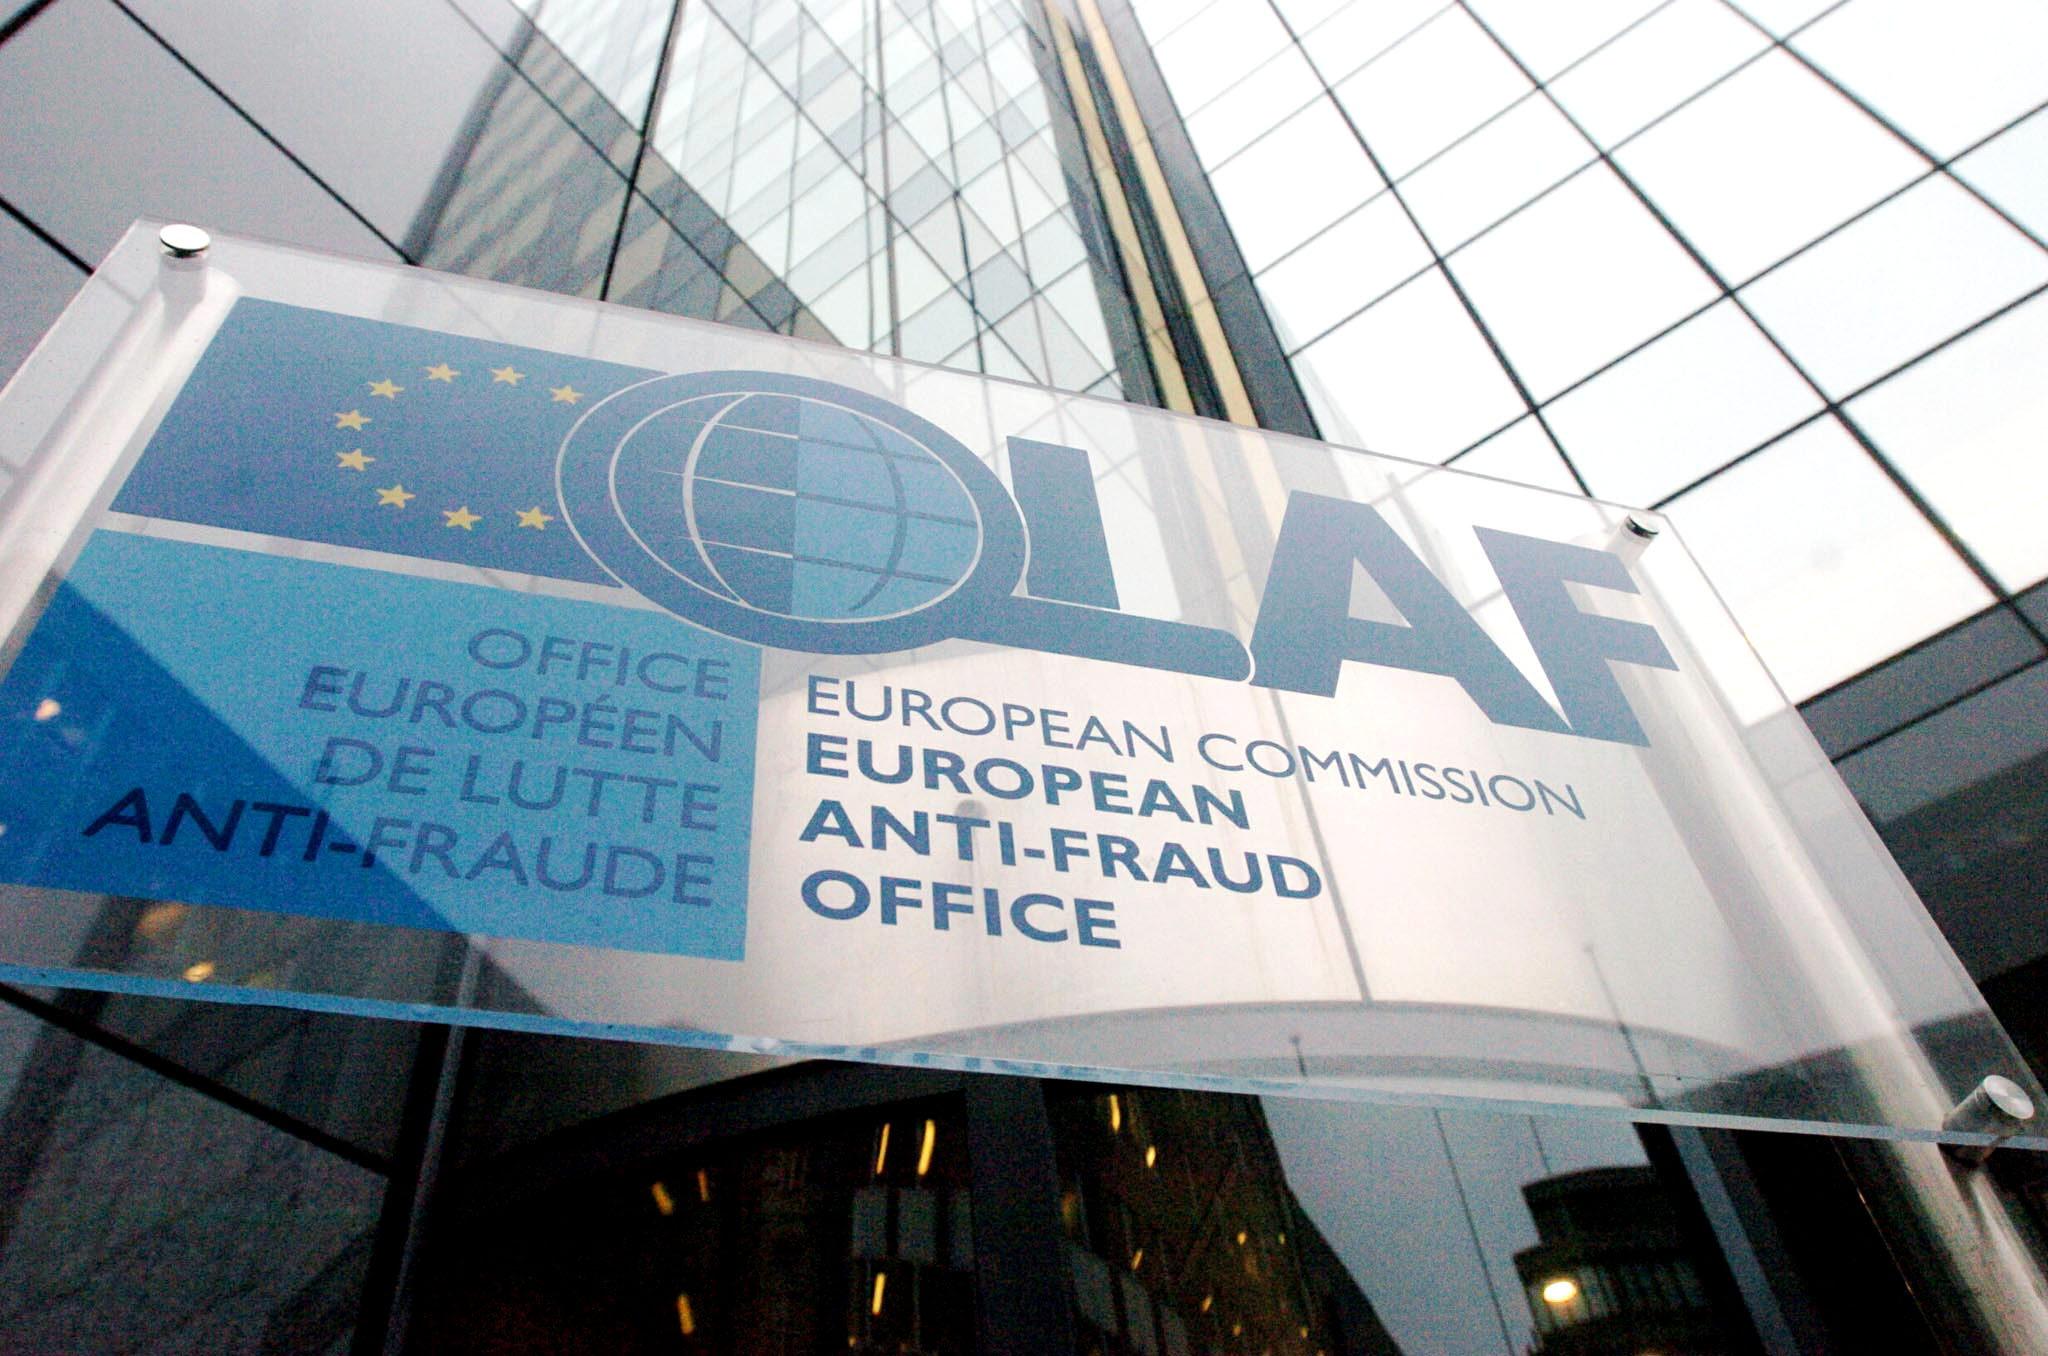 European-Anti-Fraud-Office